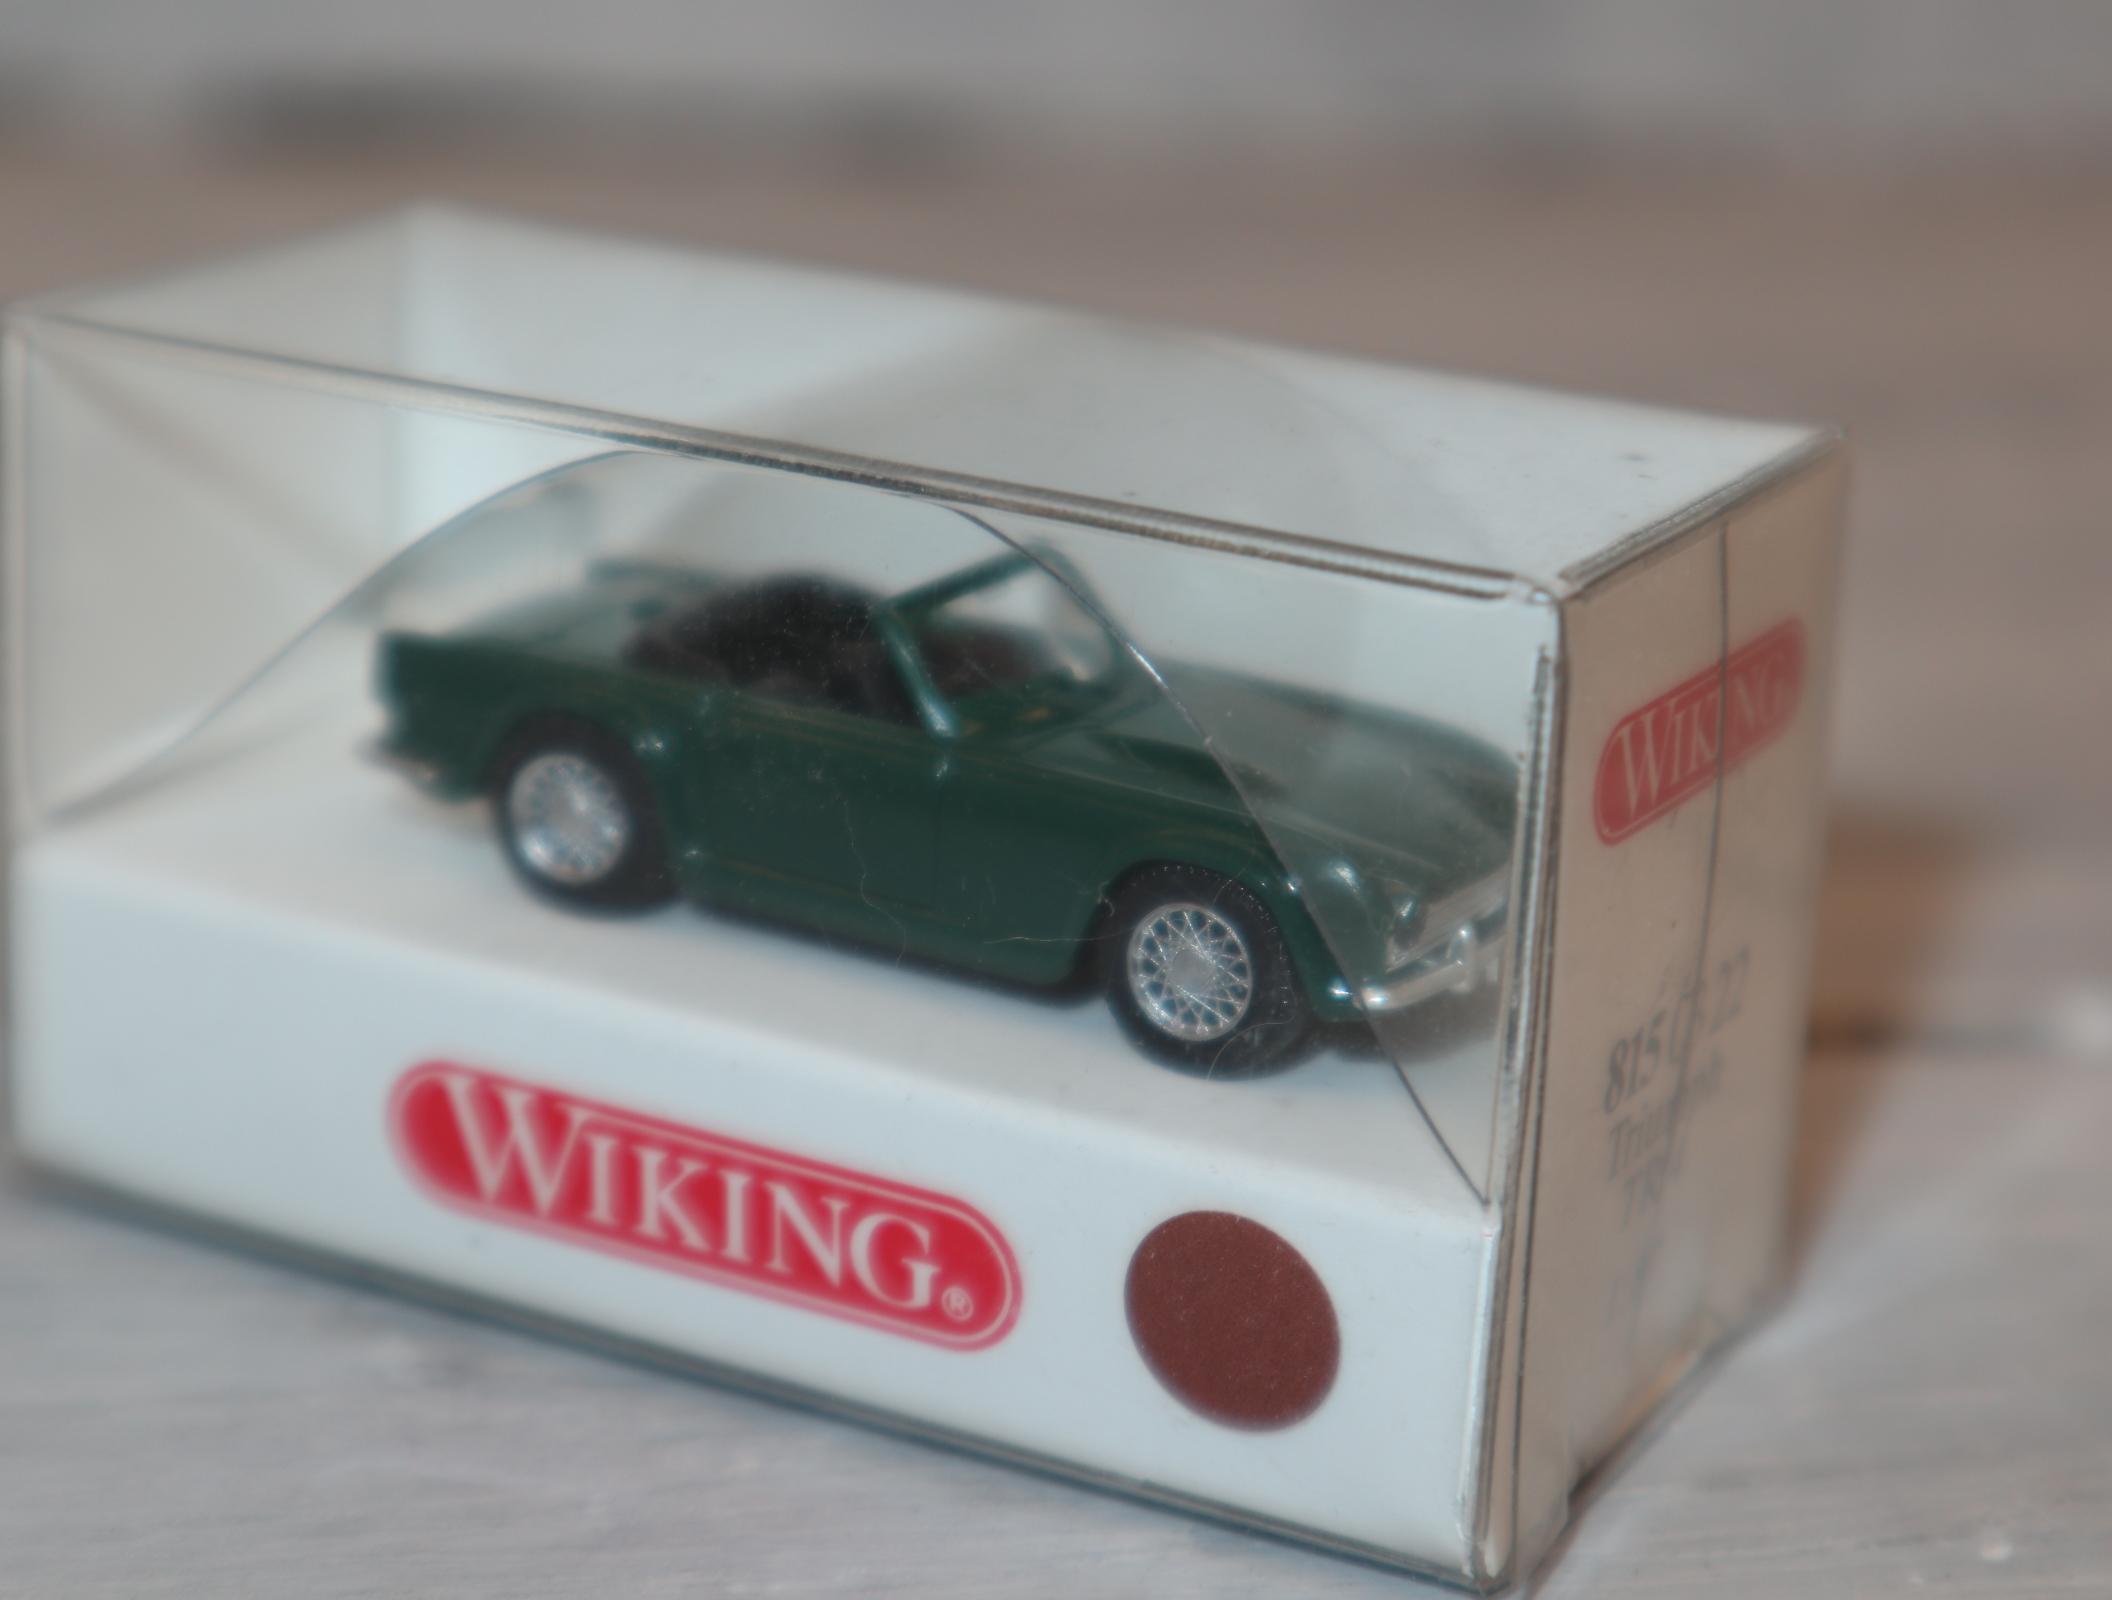 Wiking 8150322 1:87 Triumph TR4 grün OVP